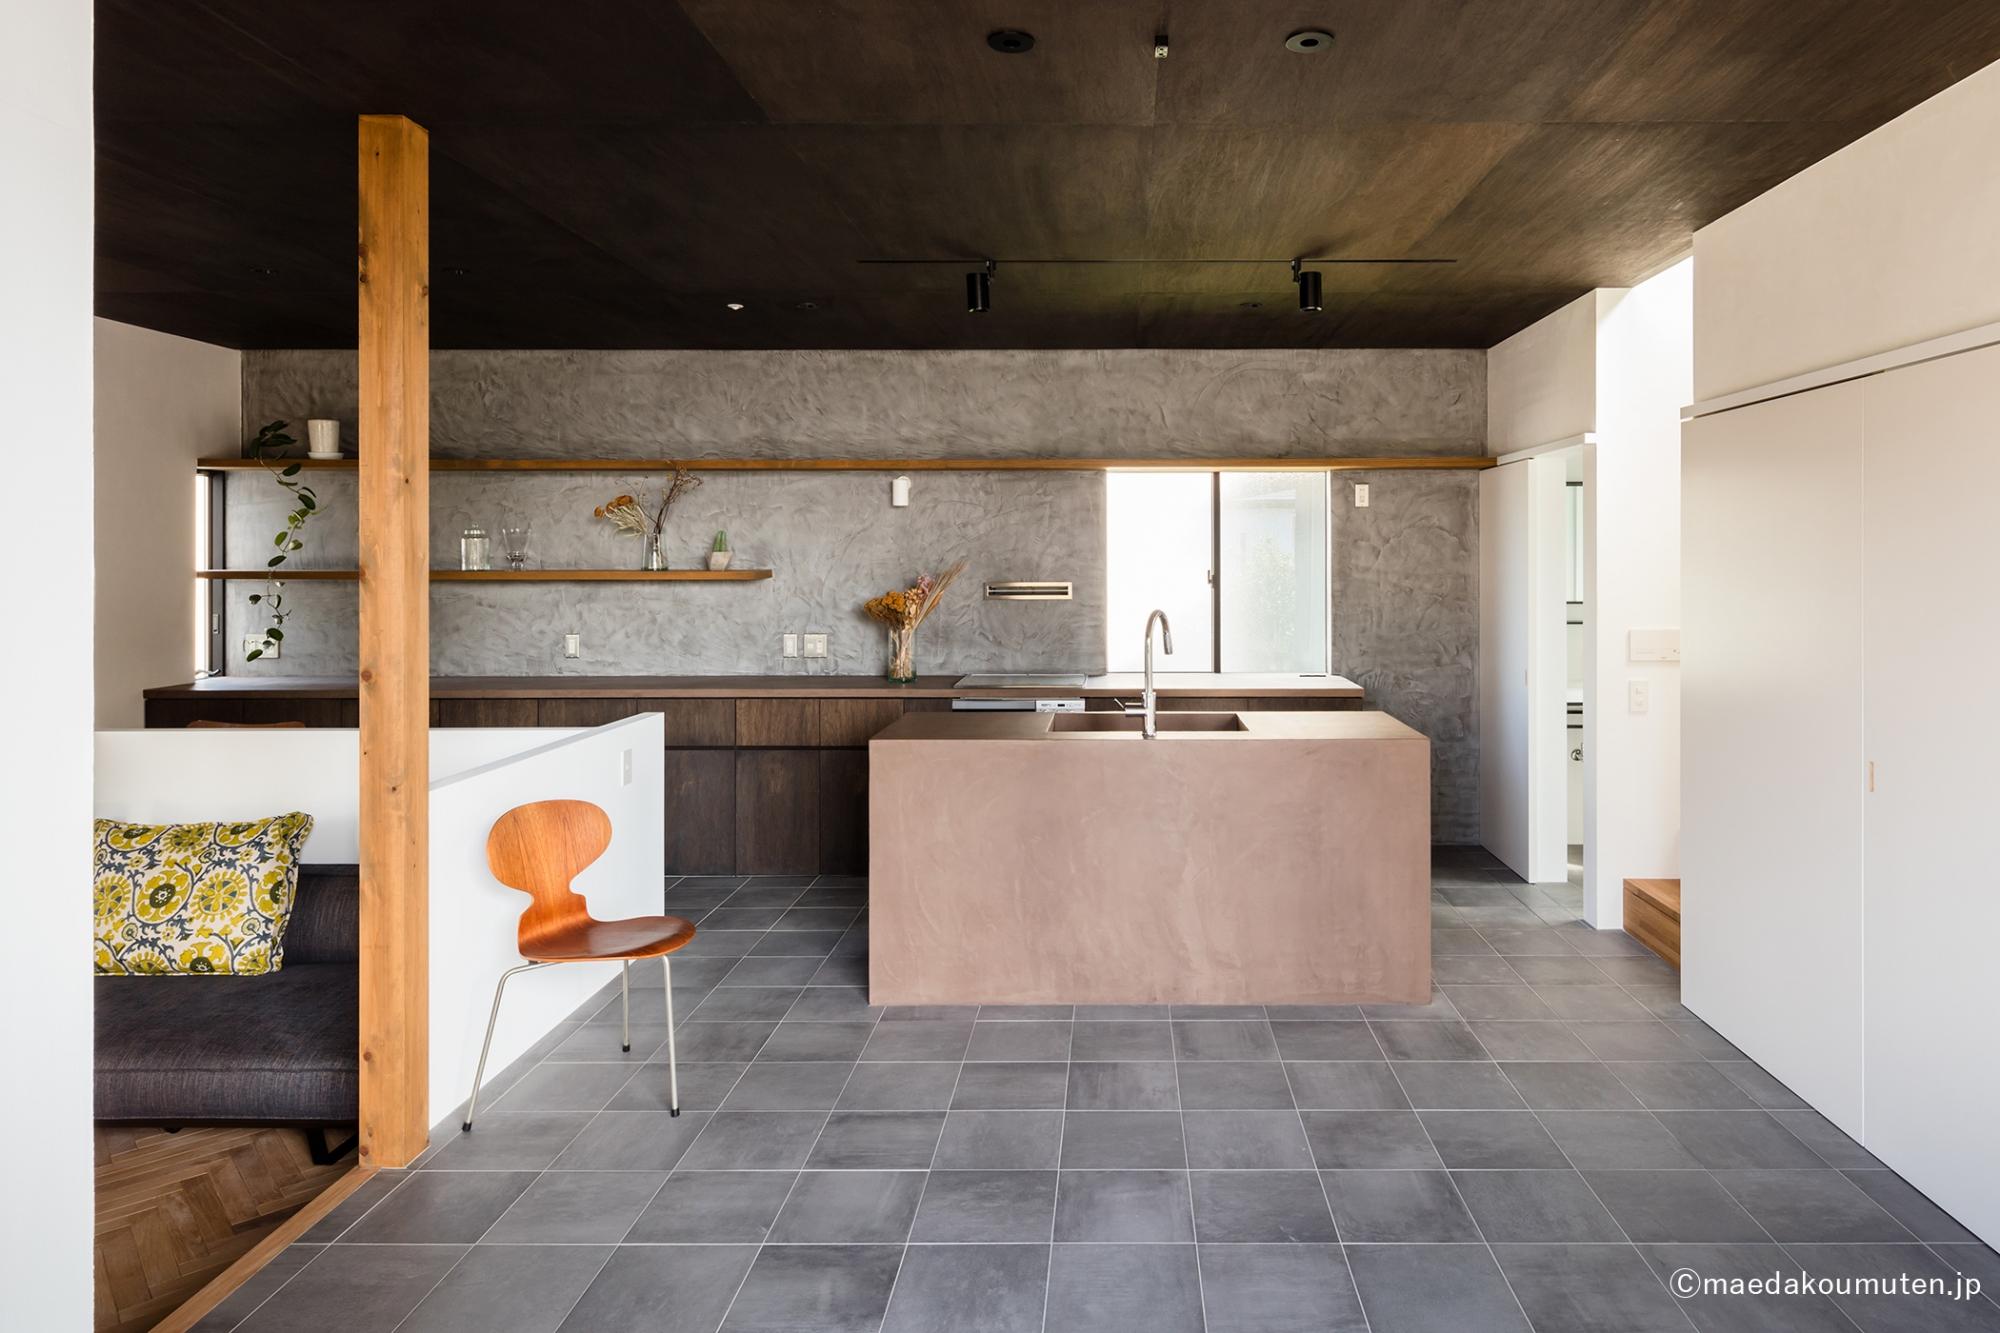 神奈川、工務店、注文住宅、デザイン住宅、建築家、大島の家、11